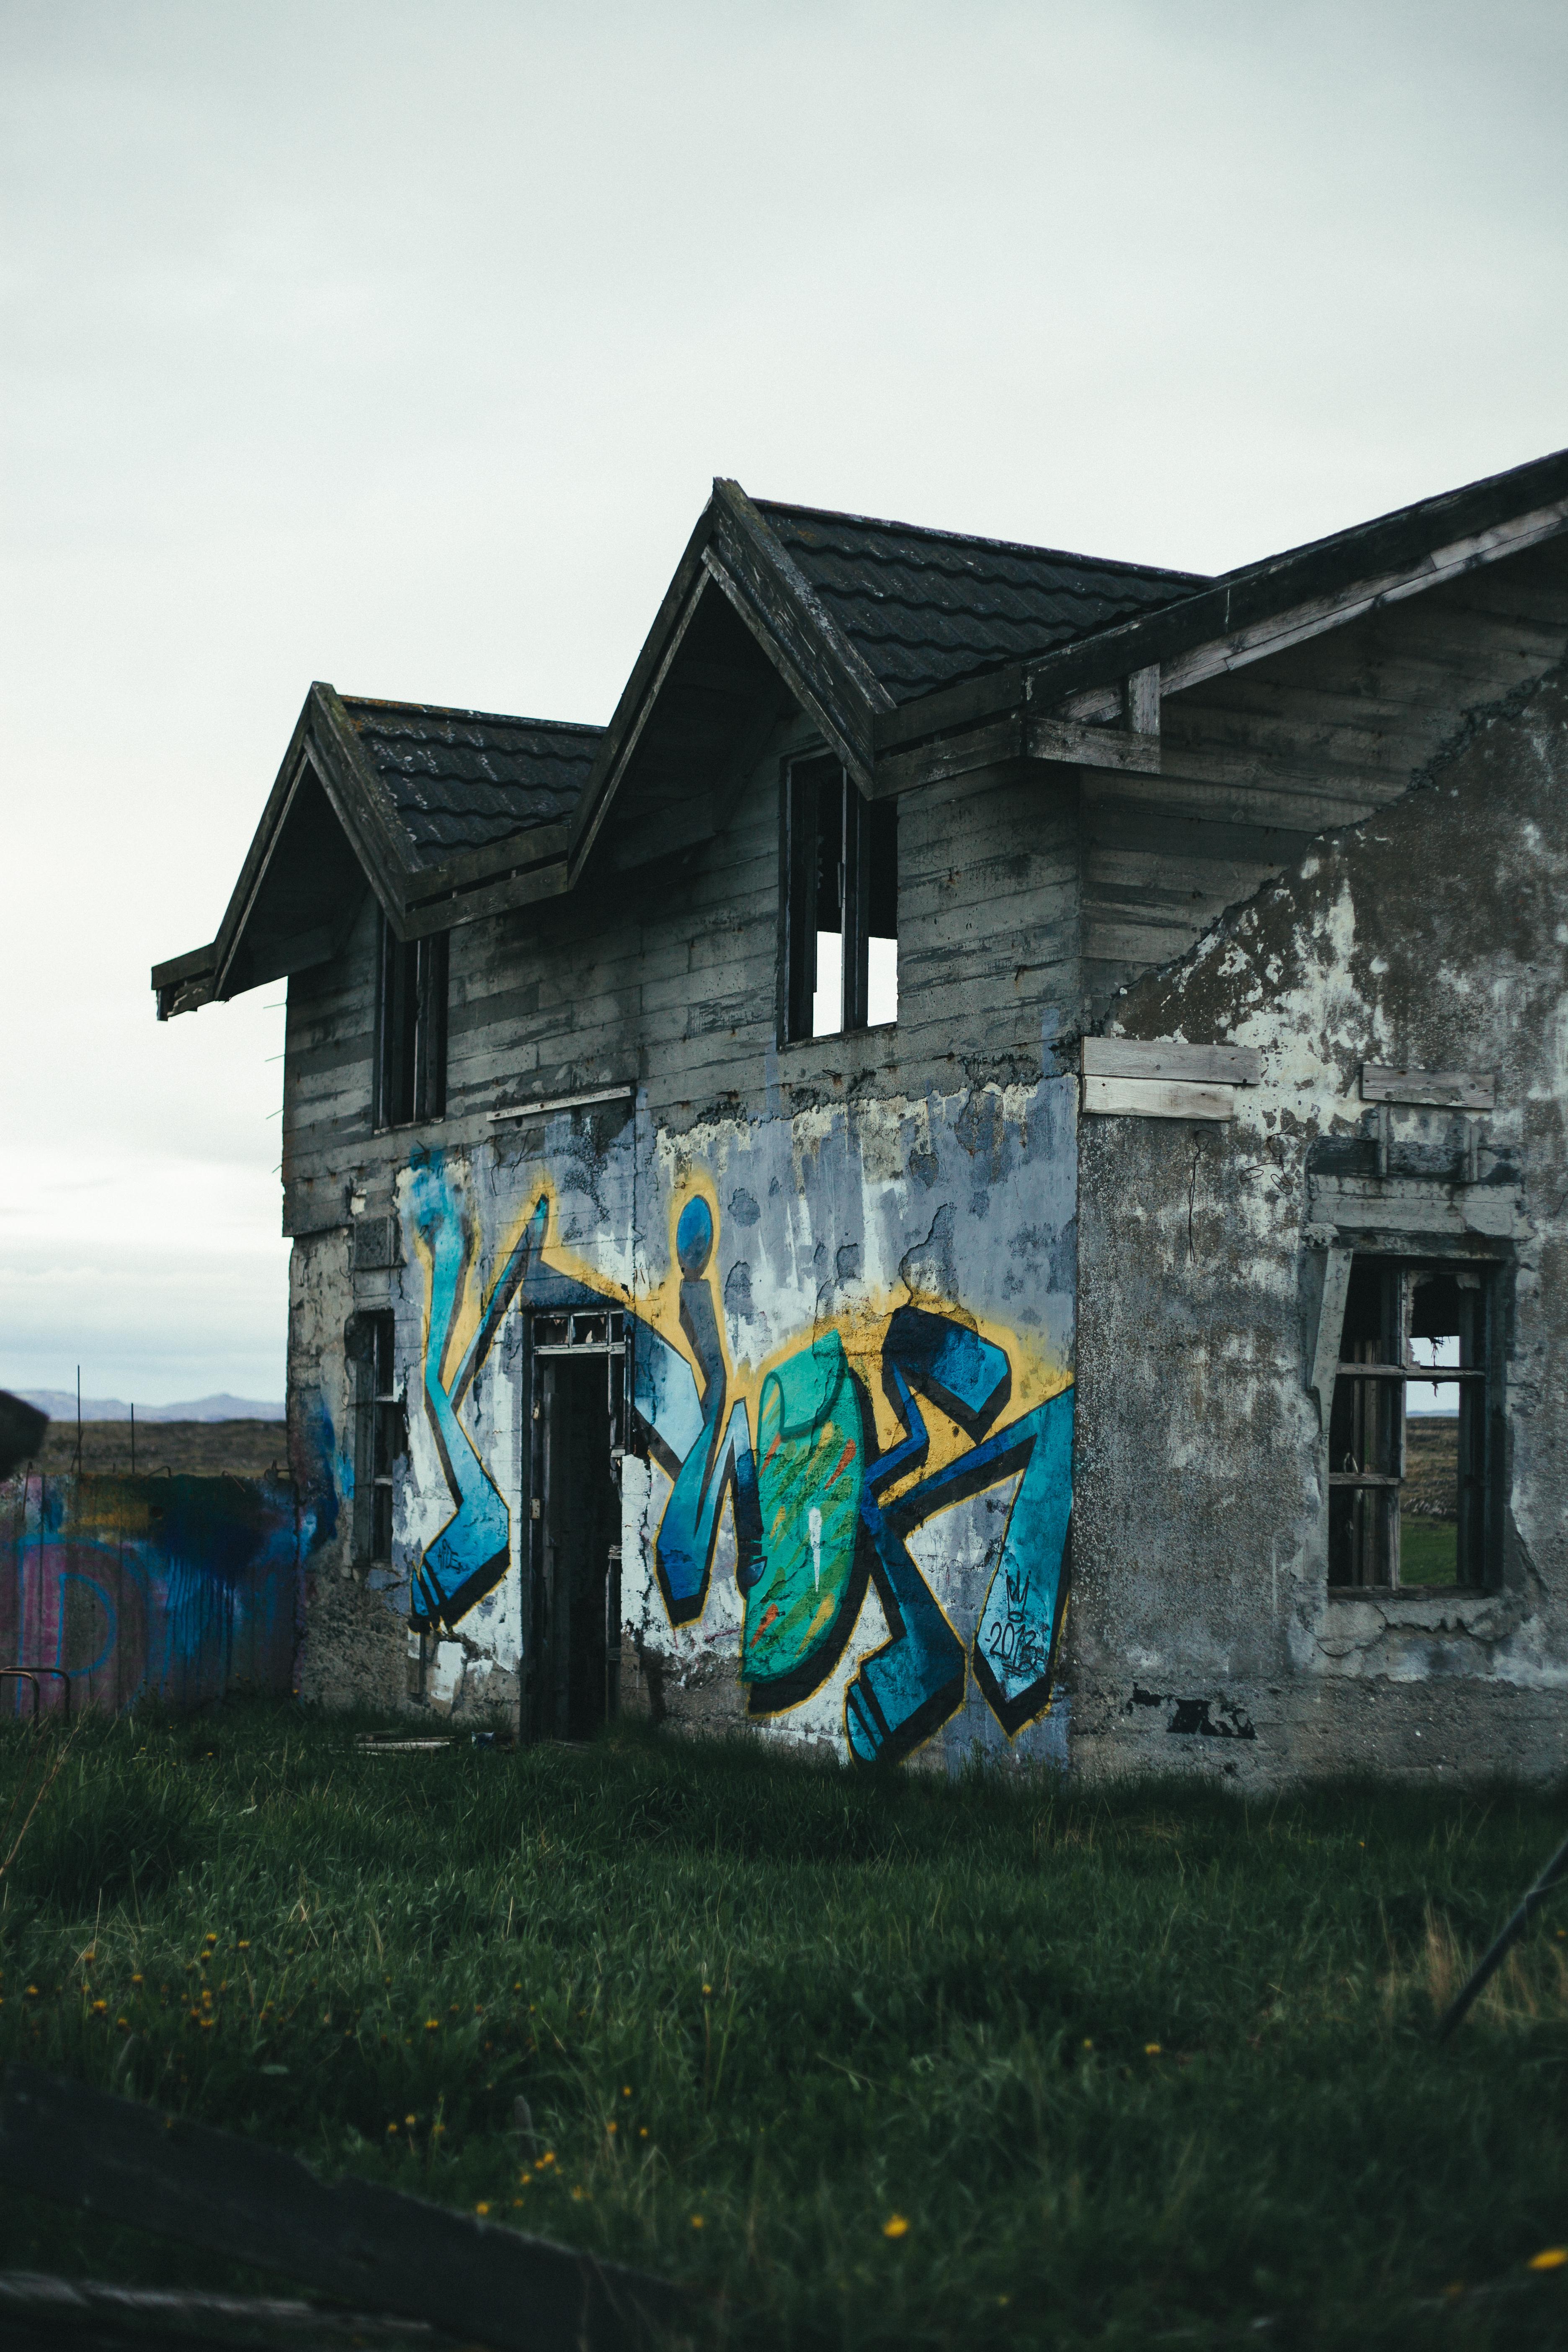 Graffiti on abandoned house photo